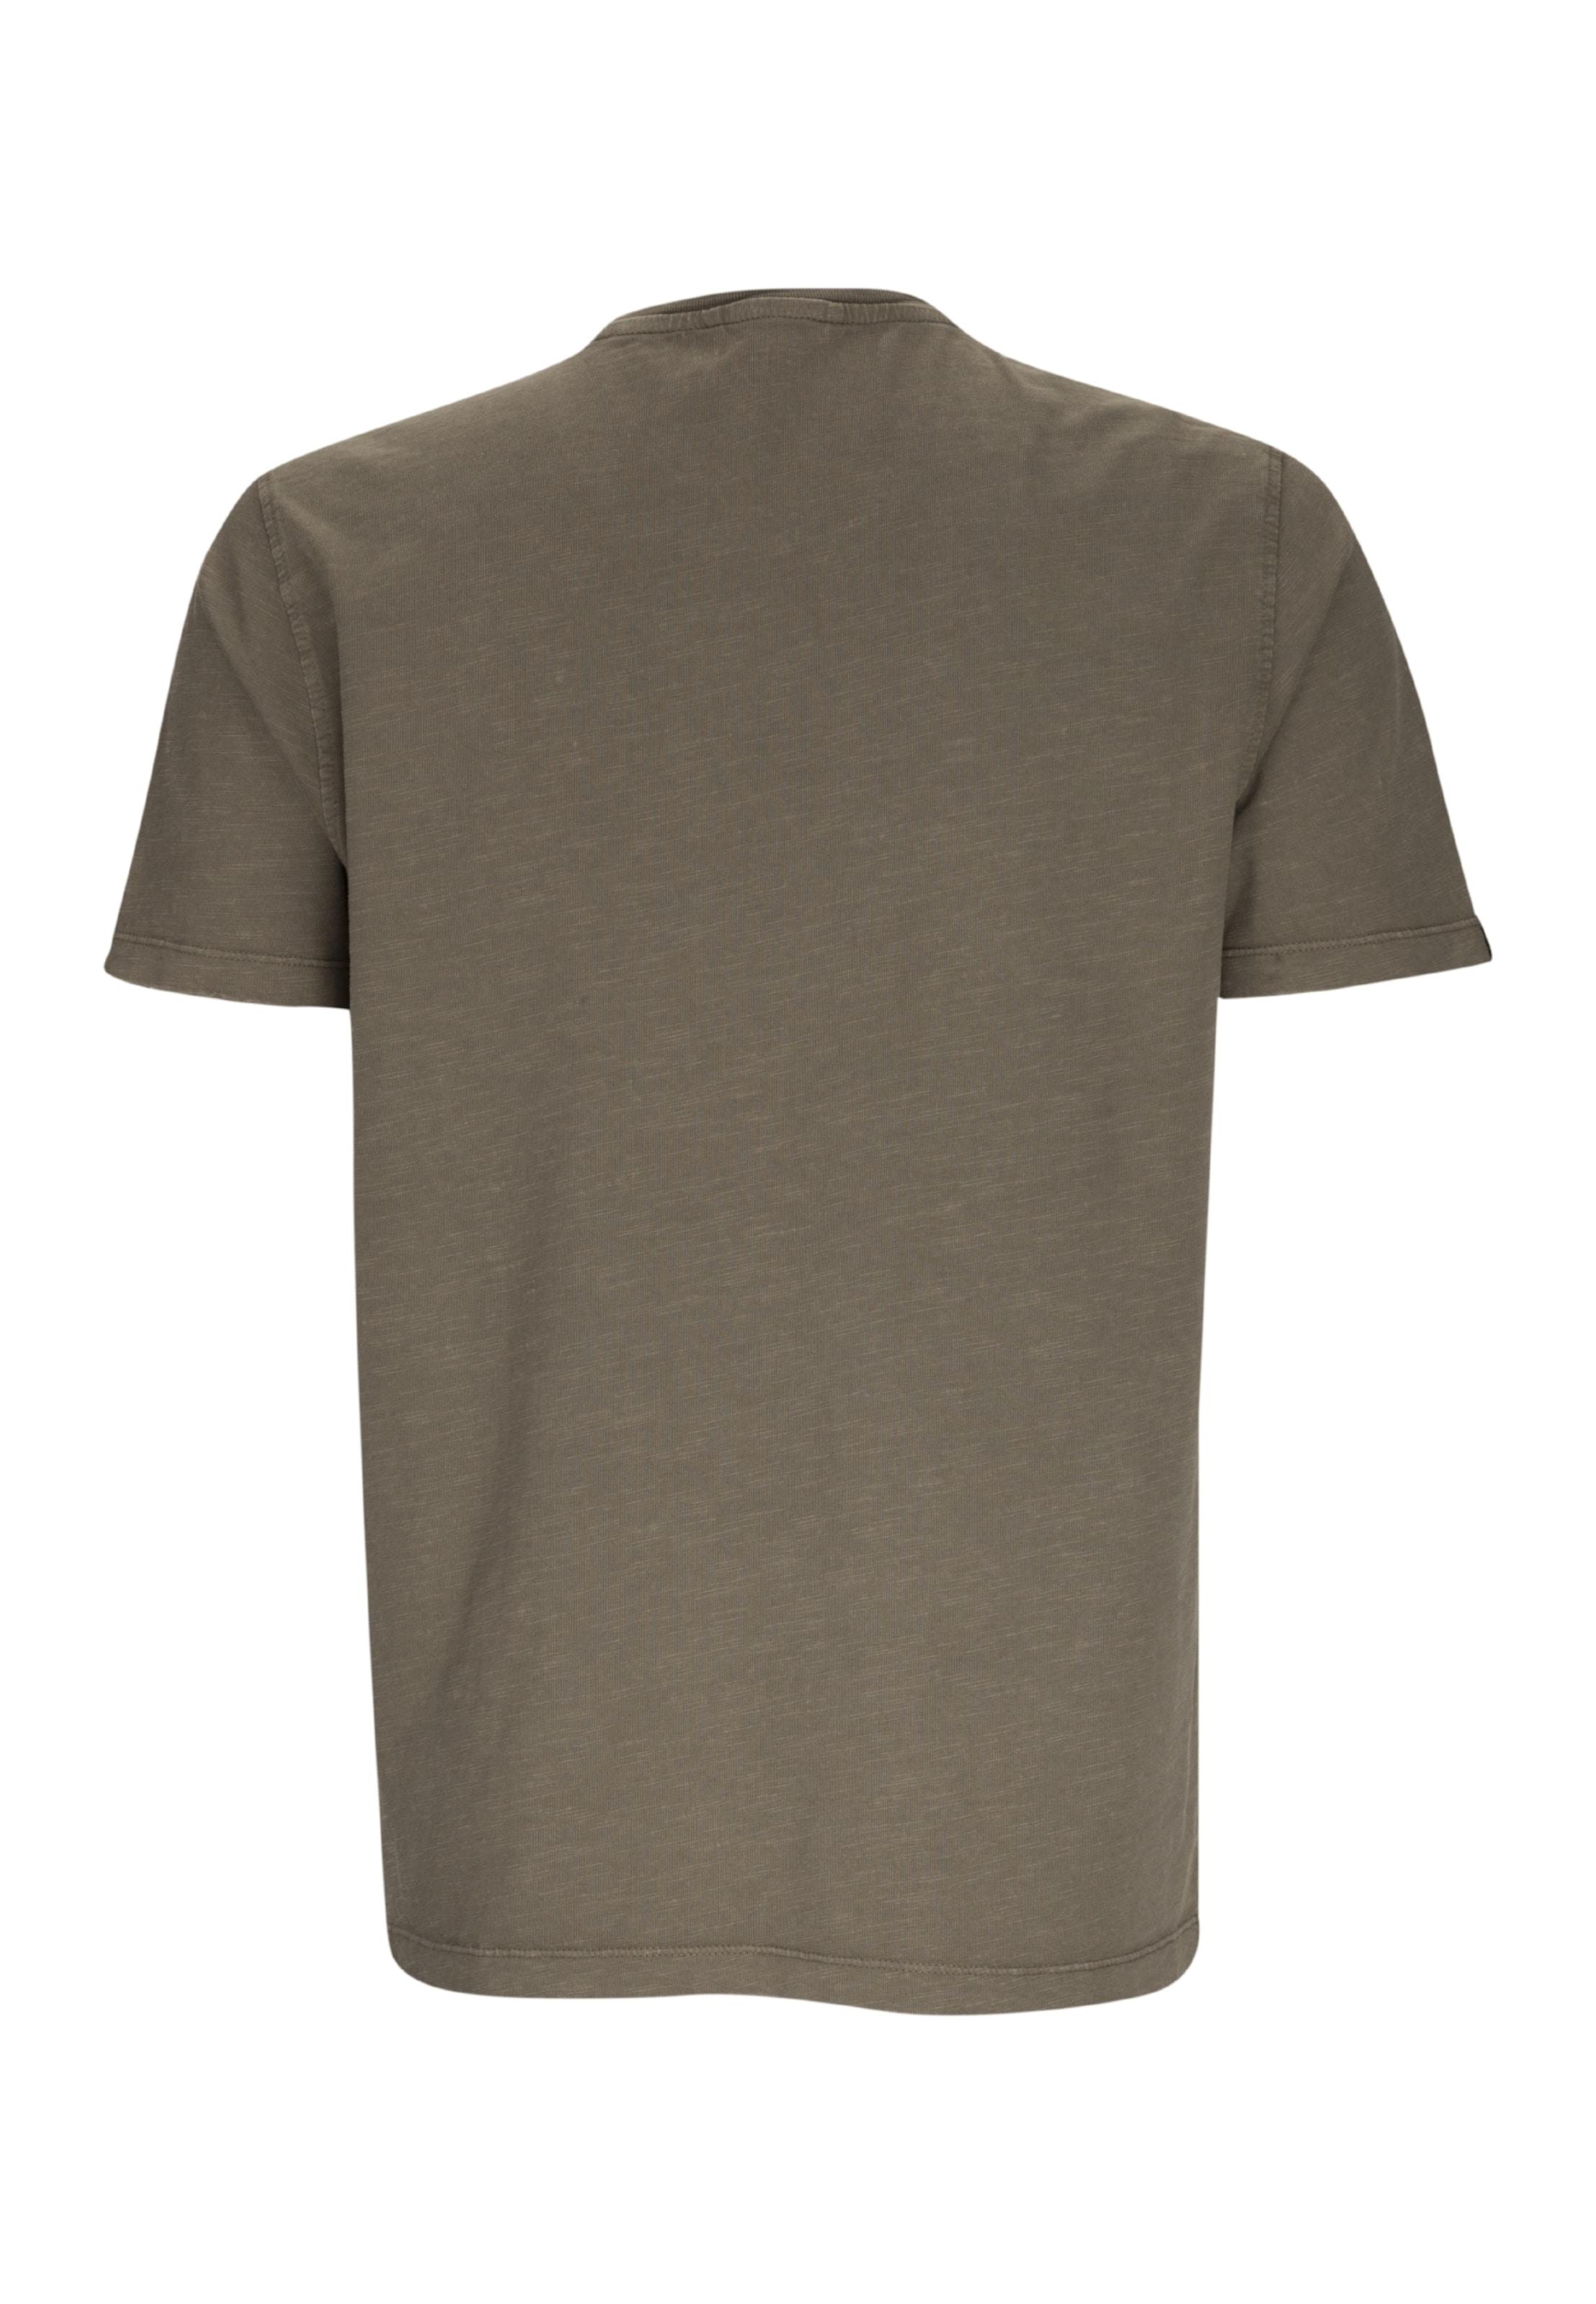 In Burgunder Active T shirt JadeGrasgrün Camel 3Rq5jAL4